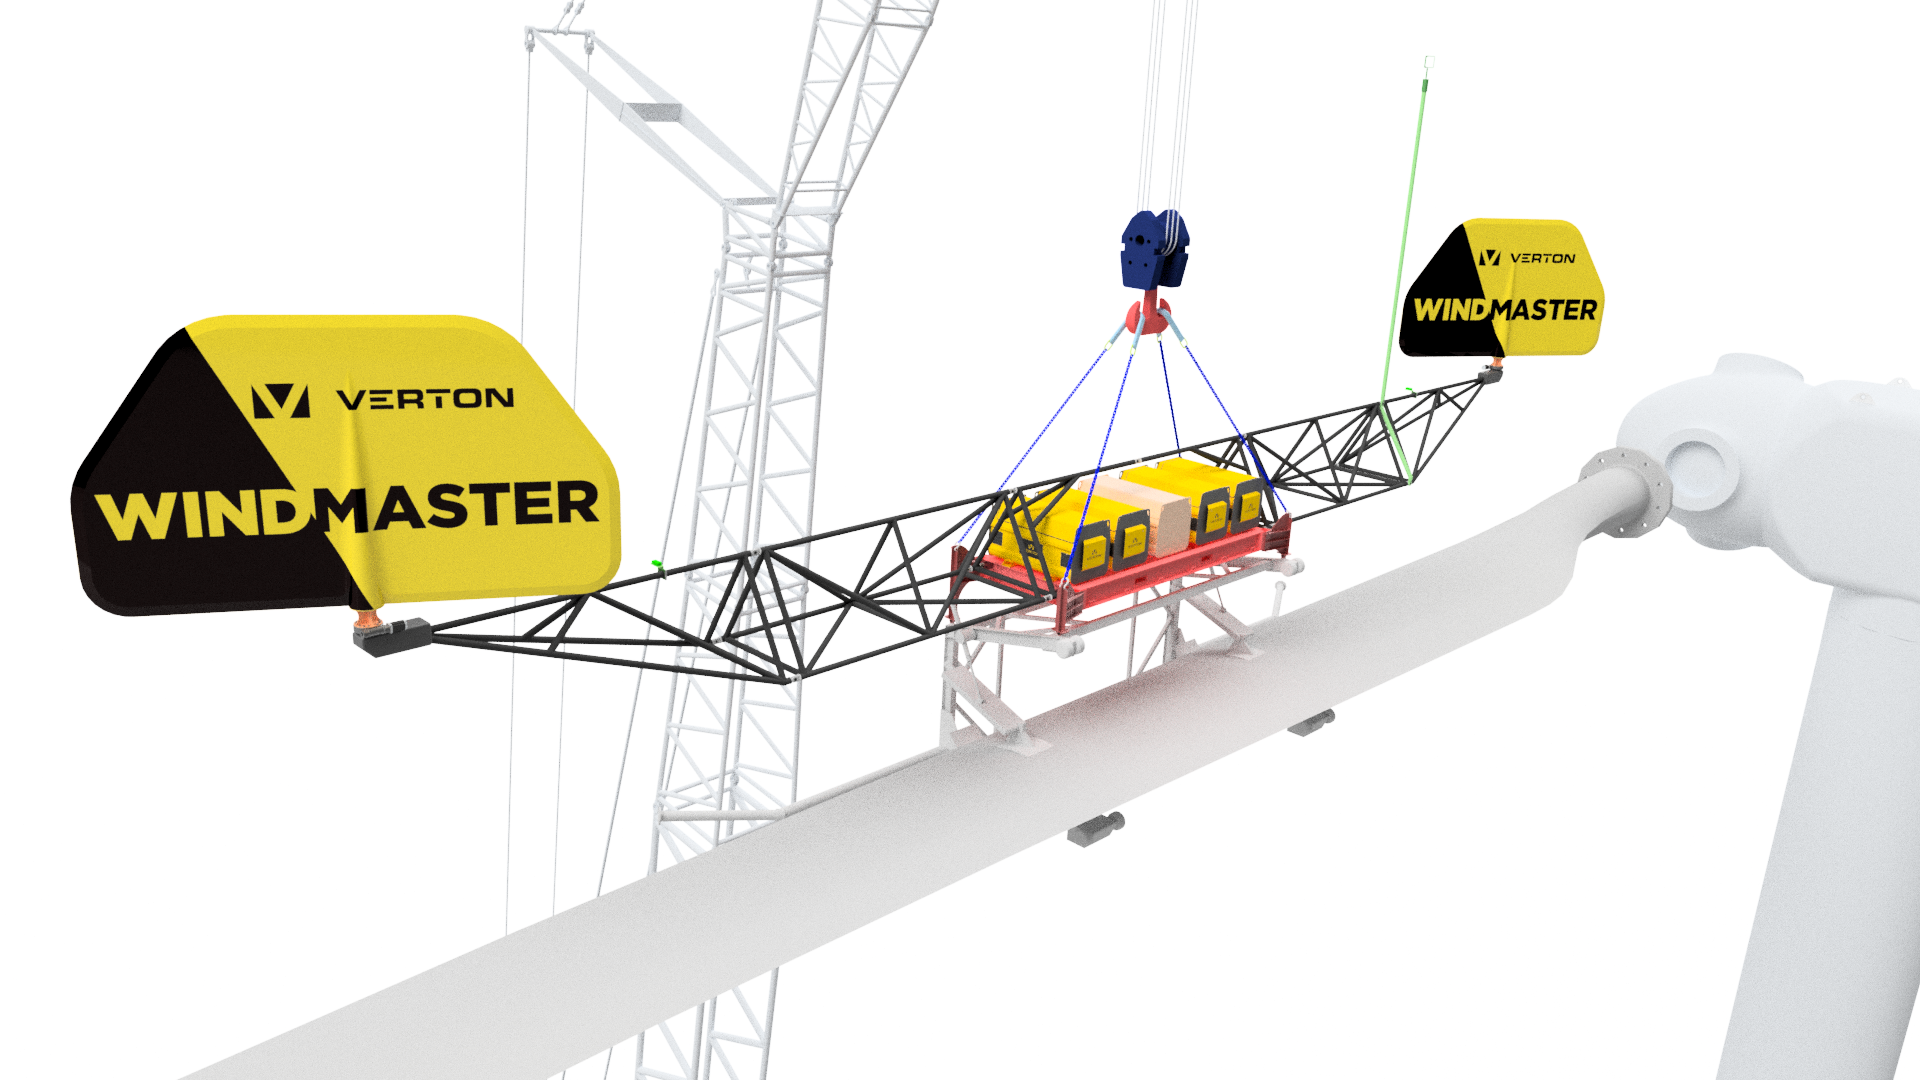 Verton Windmaster Solution